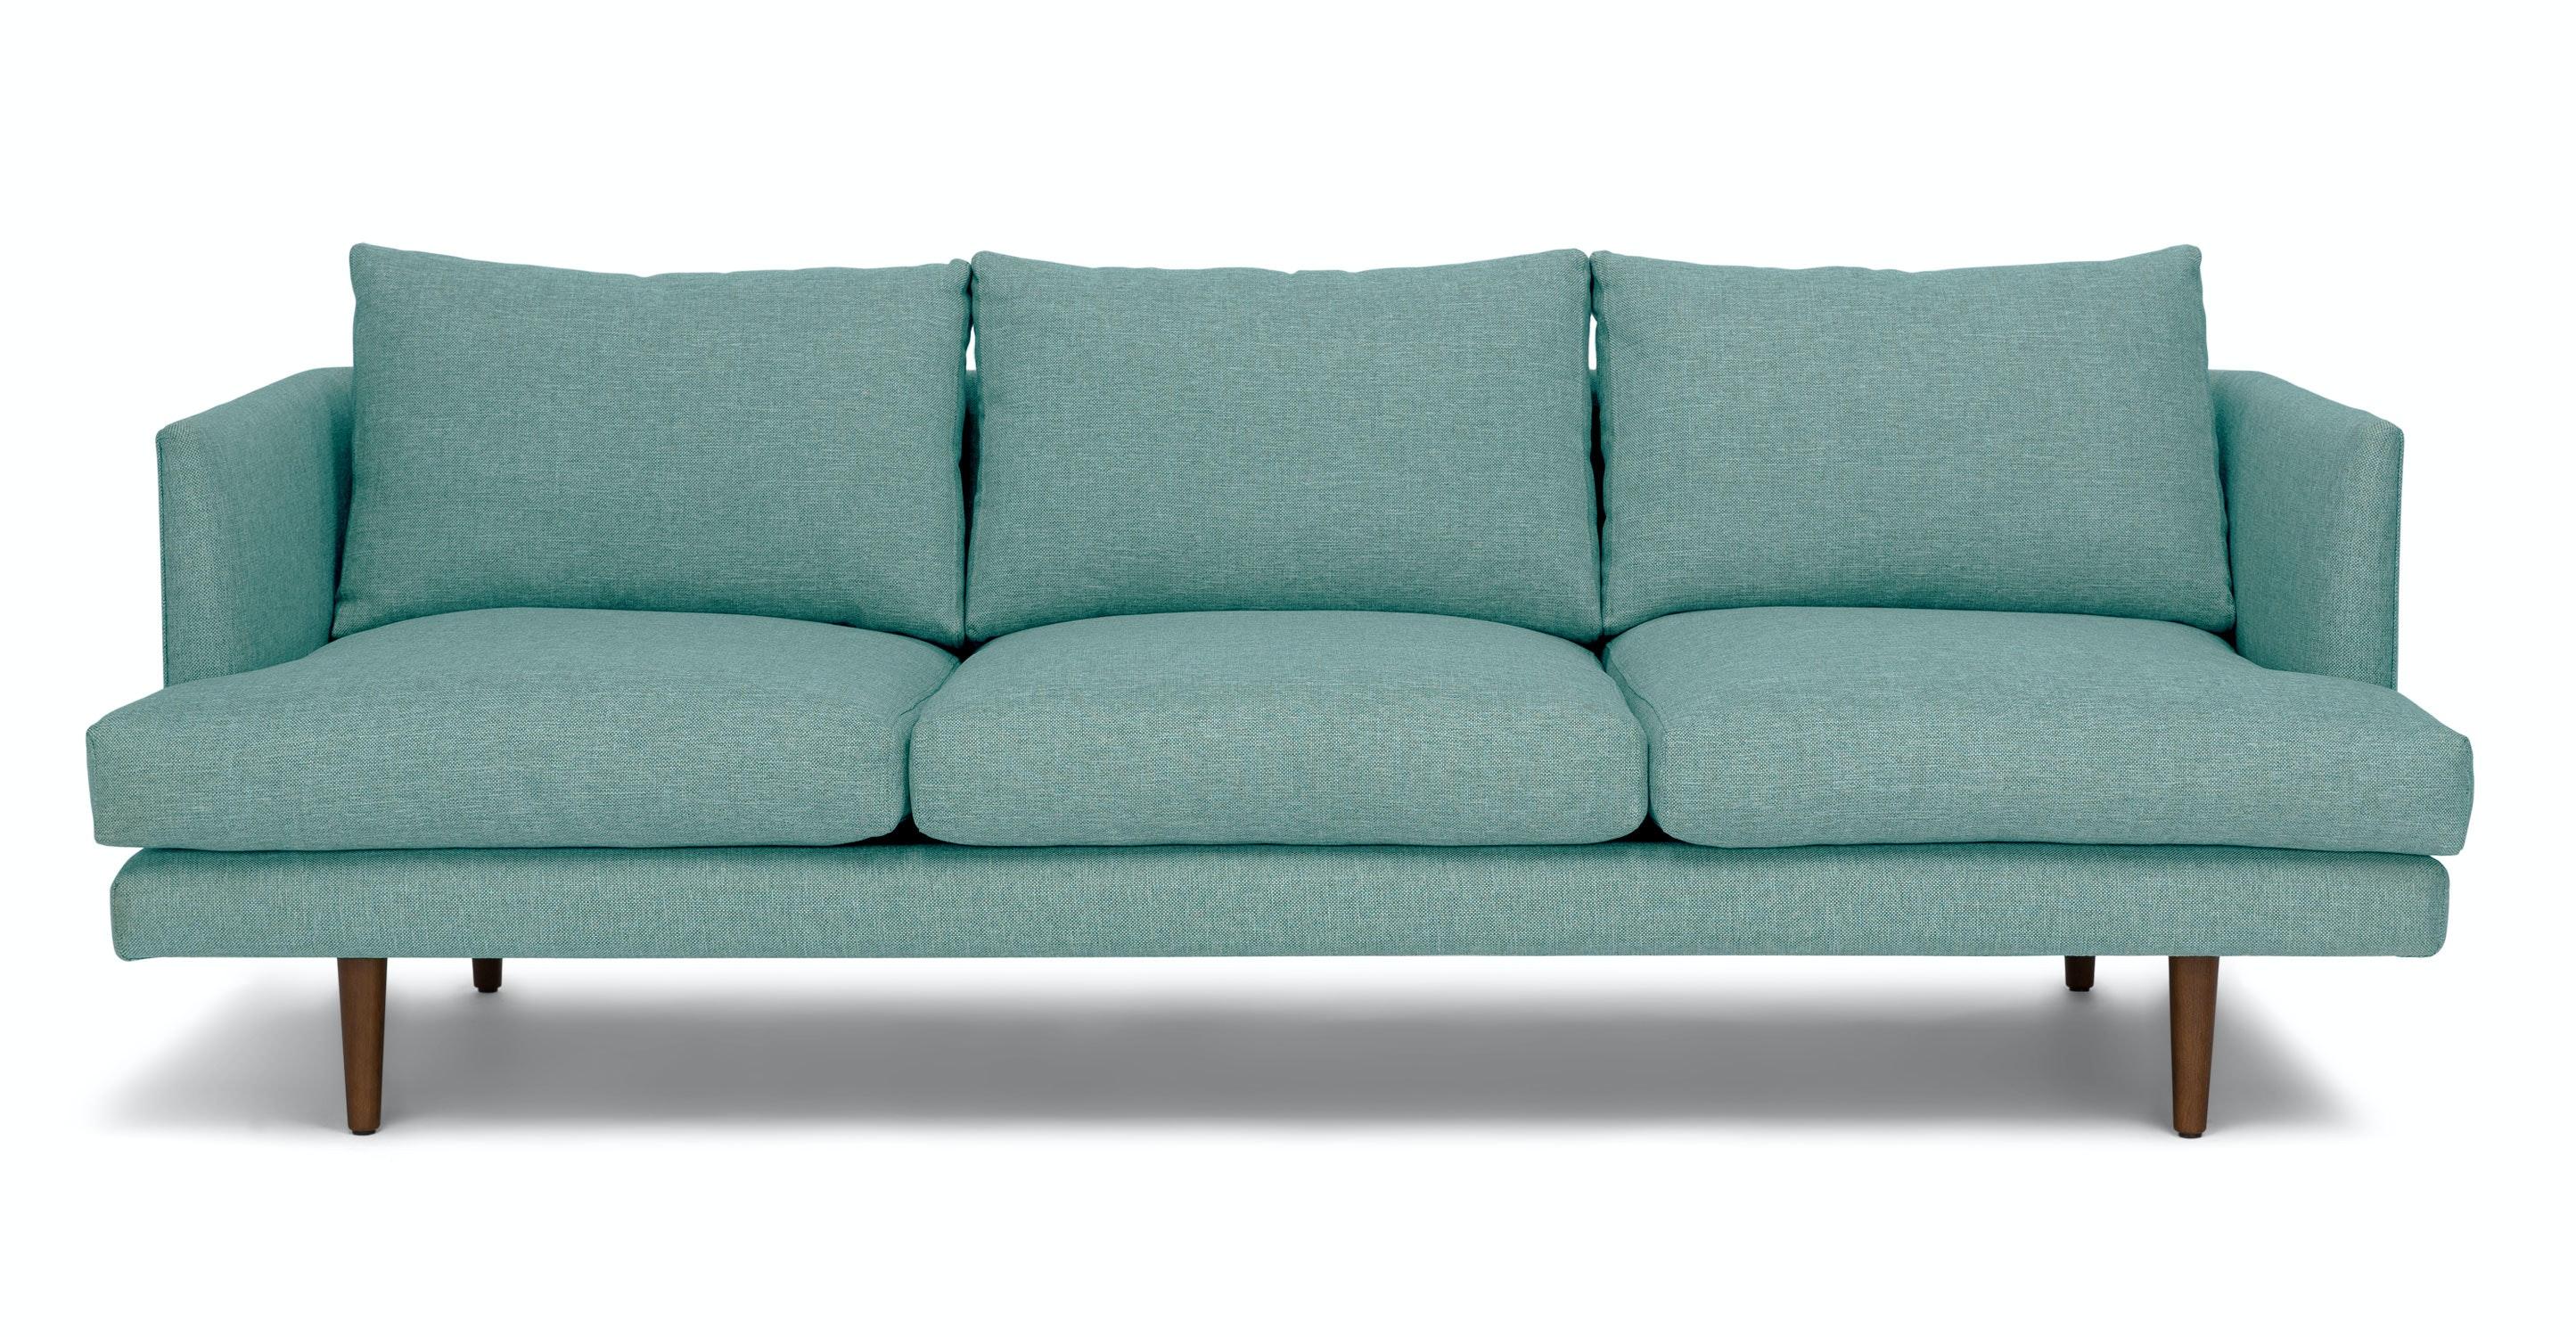 Burrard Seaglass Aqua Sofa   Sofas   Article   Modern, Mid Century And  Scandinavian Furniture